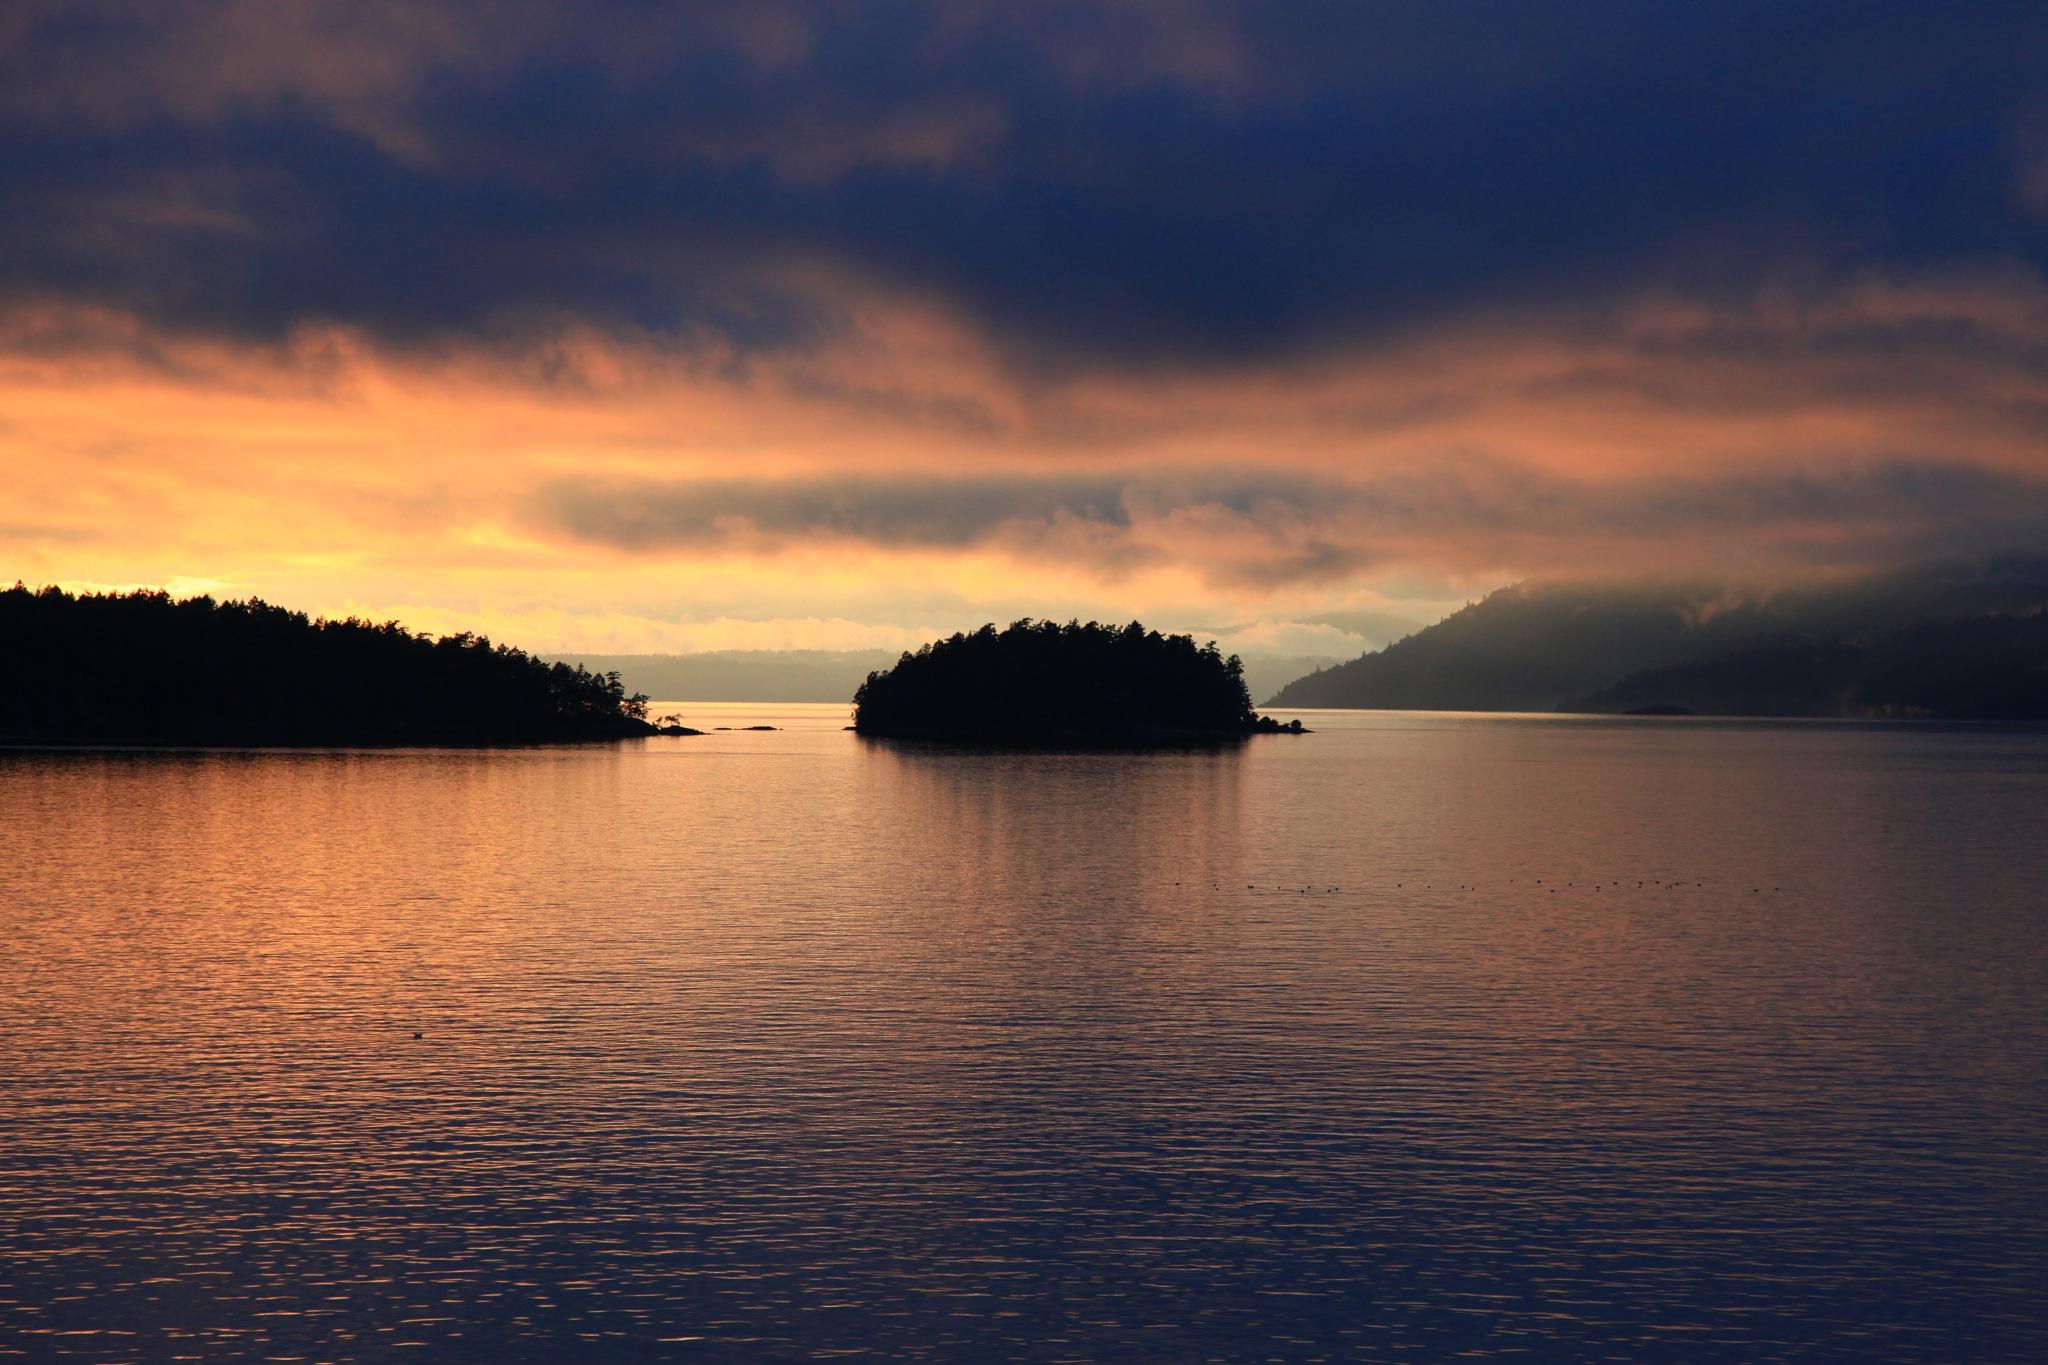 Gulf Islands British Columbia by Miloliidrifter